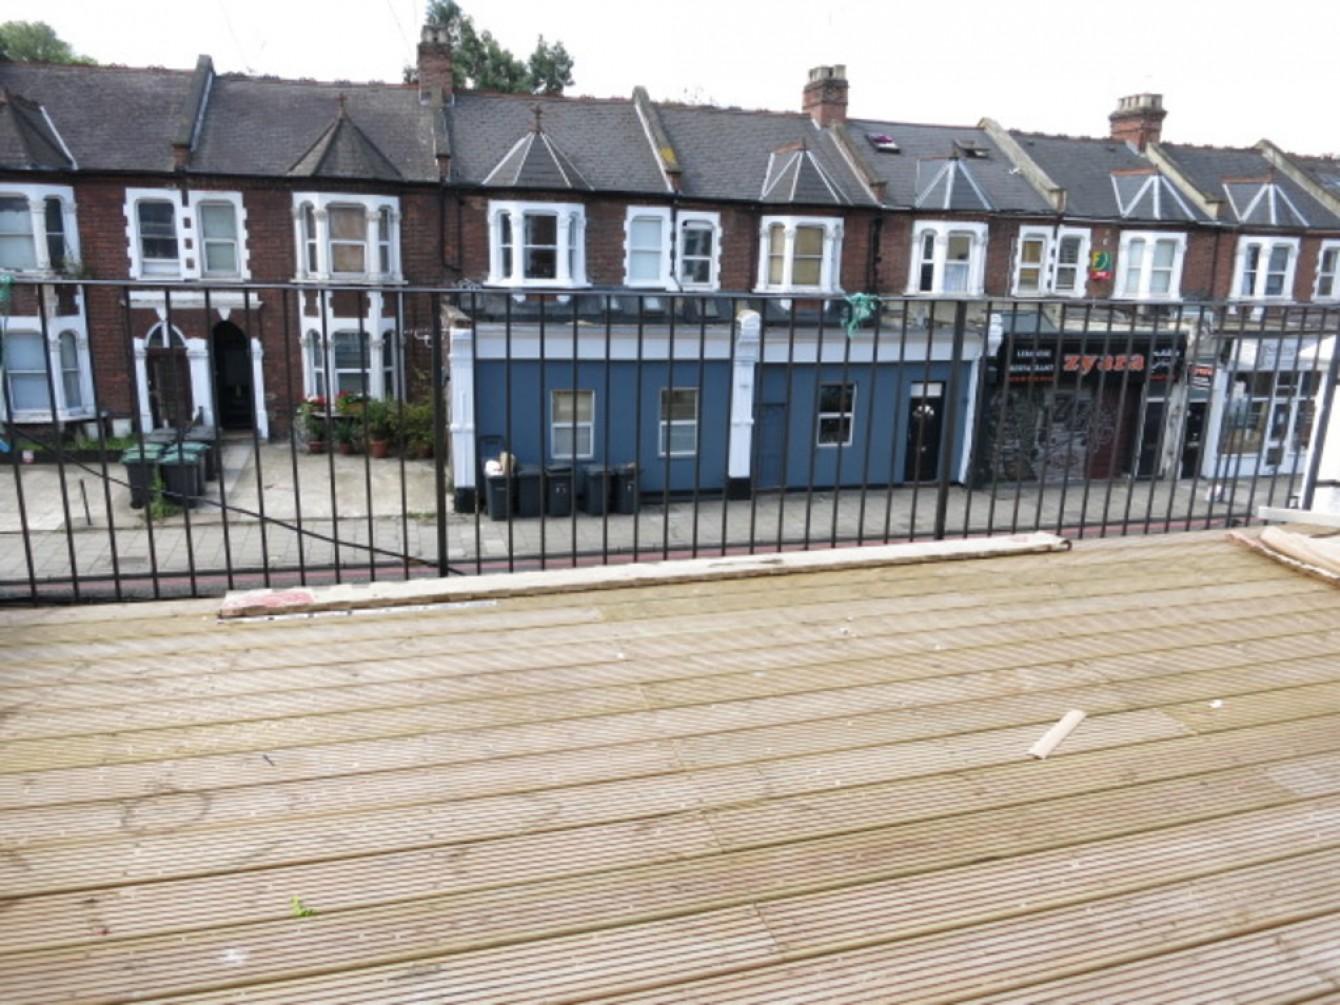 Images for Archway Road, Highgate, London EAID:c8d5f0ae42d594d169bca90f3b8b041a BID:1